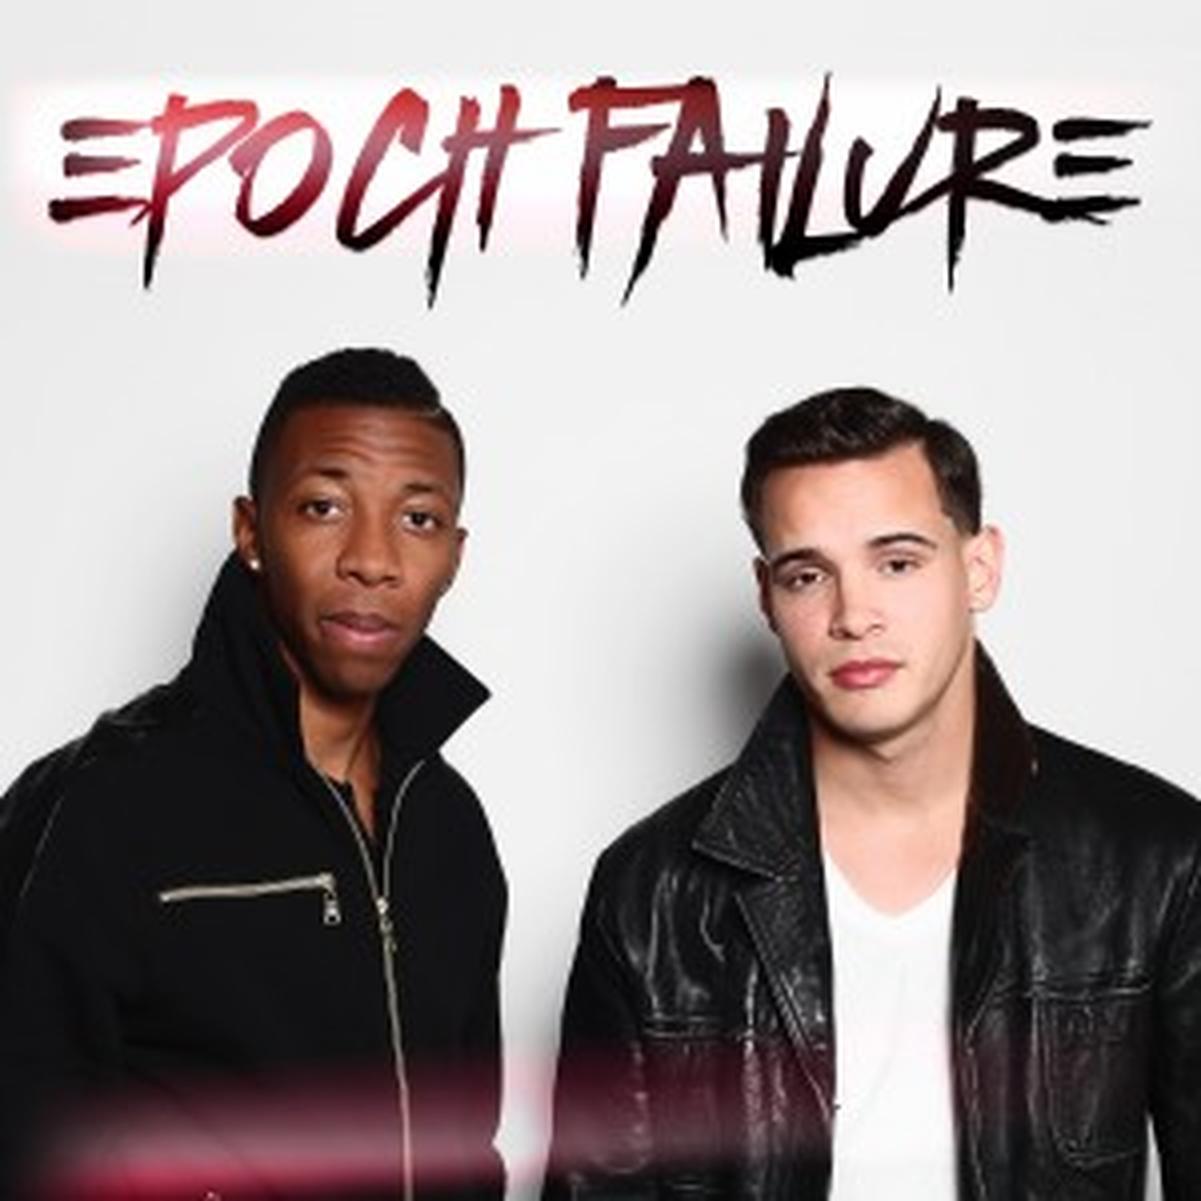 Epoch Failure